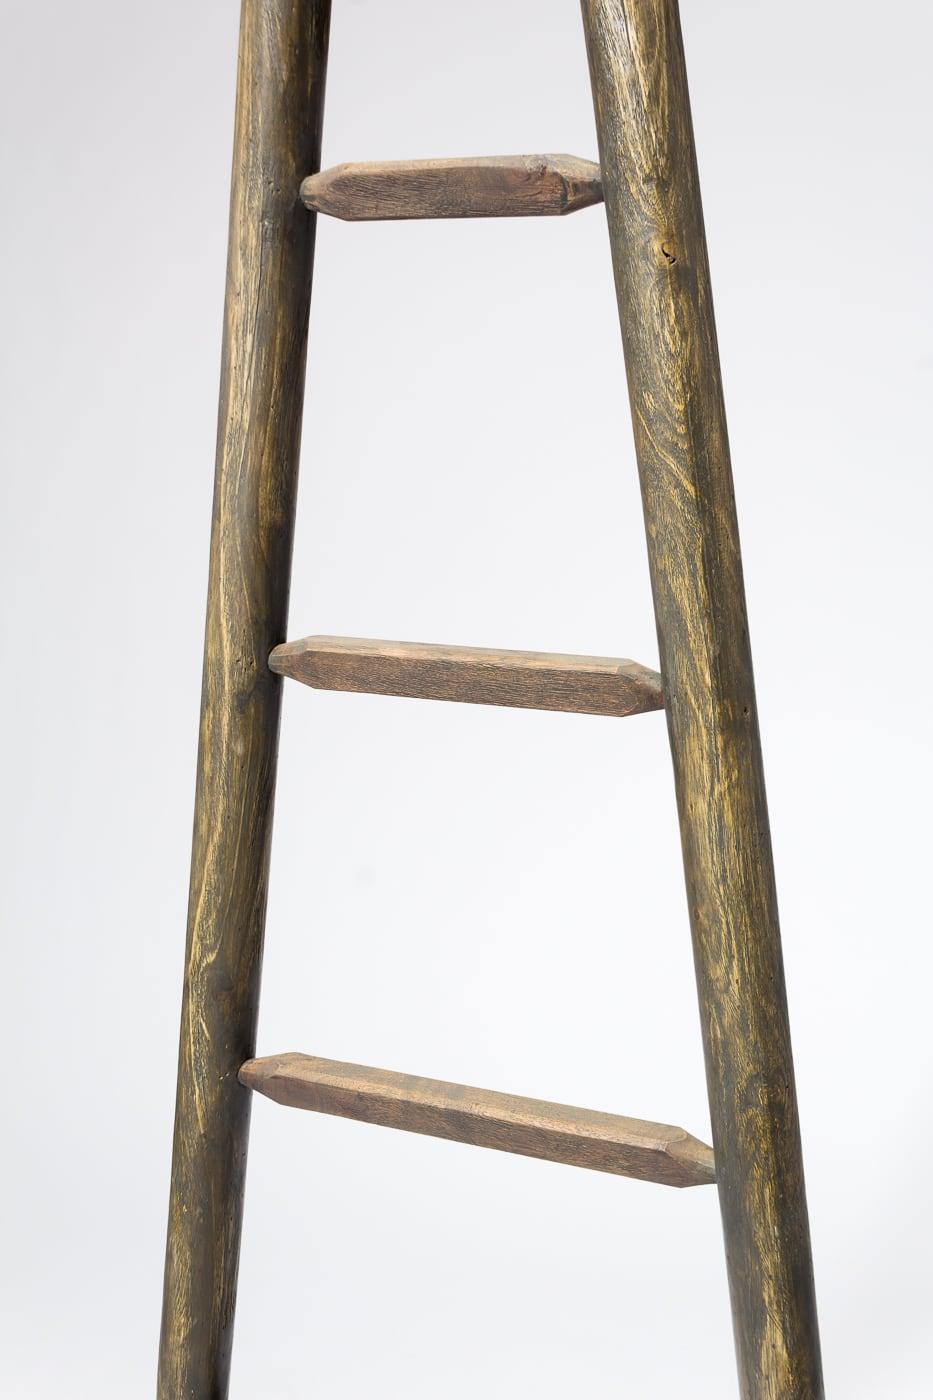 LA018 8 Foot Tapered Orchard Ladder Prop Rental | ACME Brooklyn